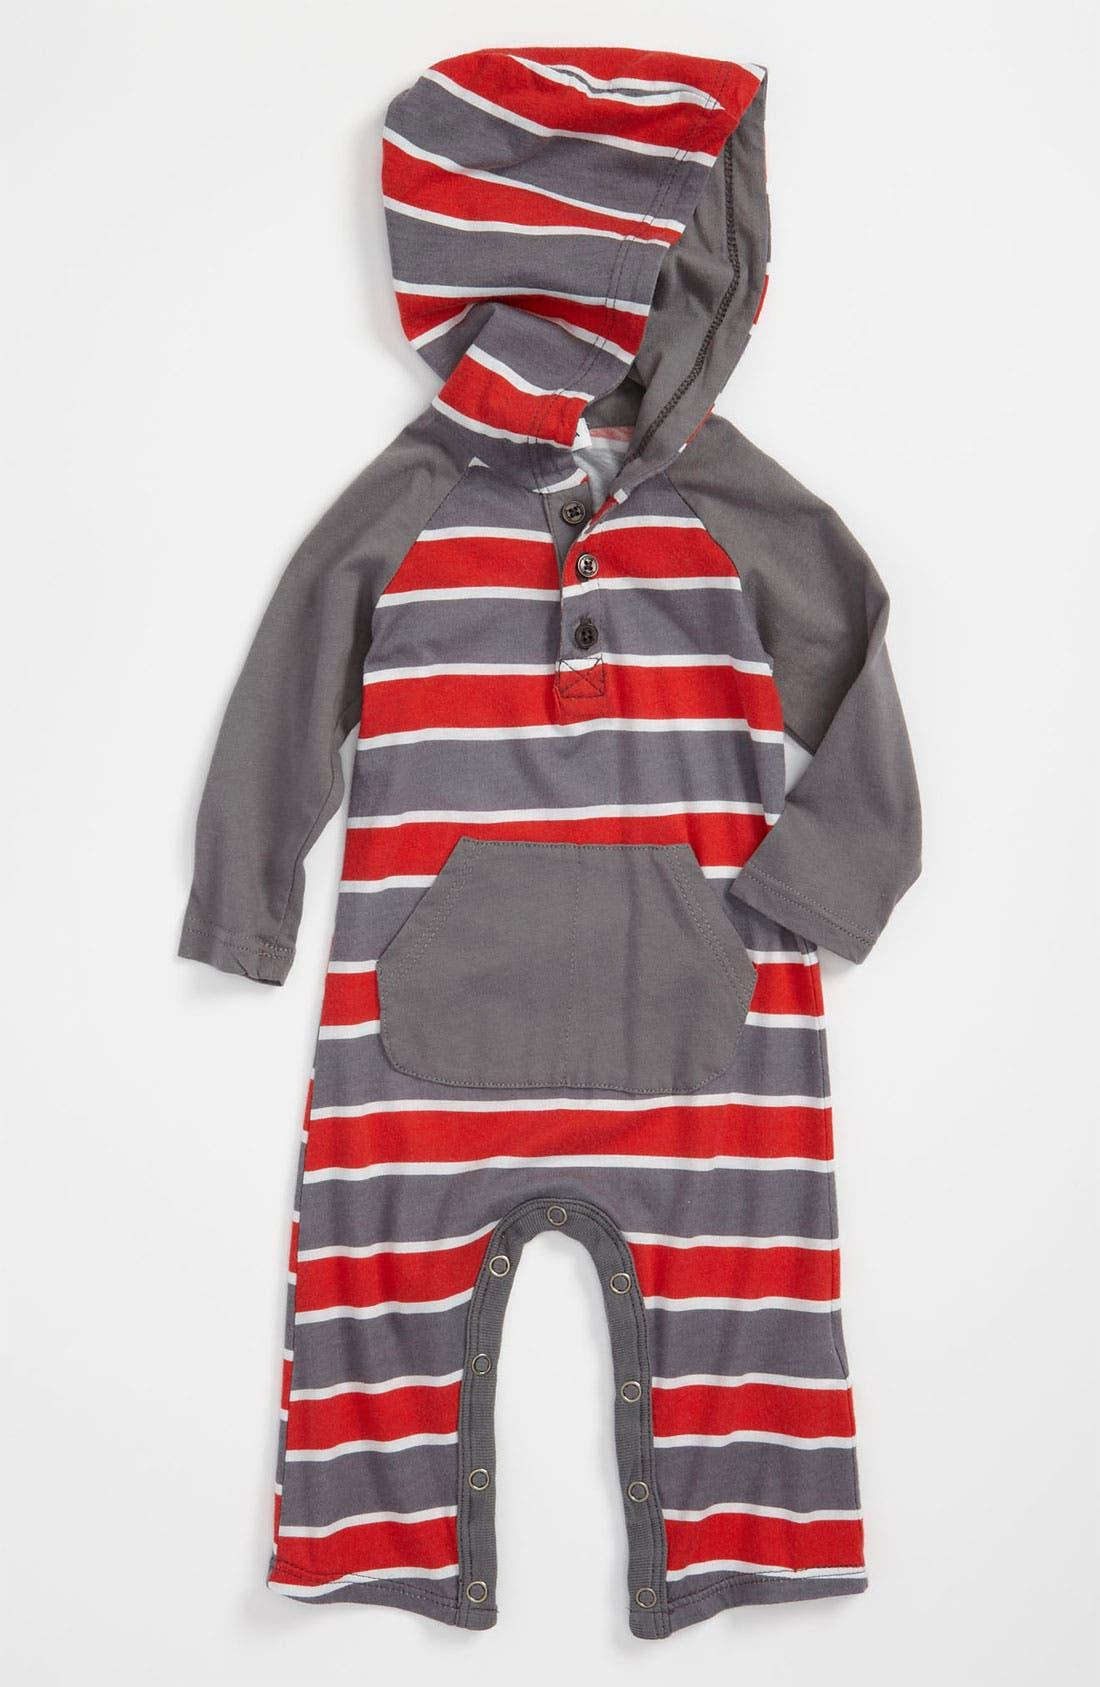 Alternate Image 1 Selected - Splendid 'Chesapeake Rugby' Hooded Romper (Infant)